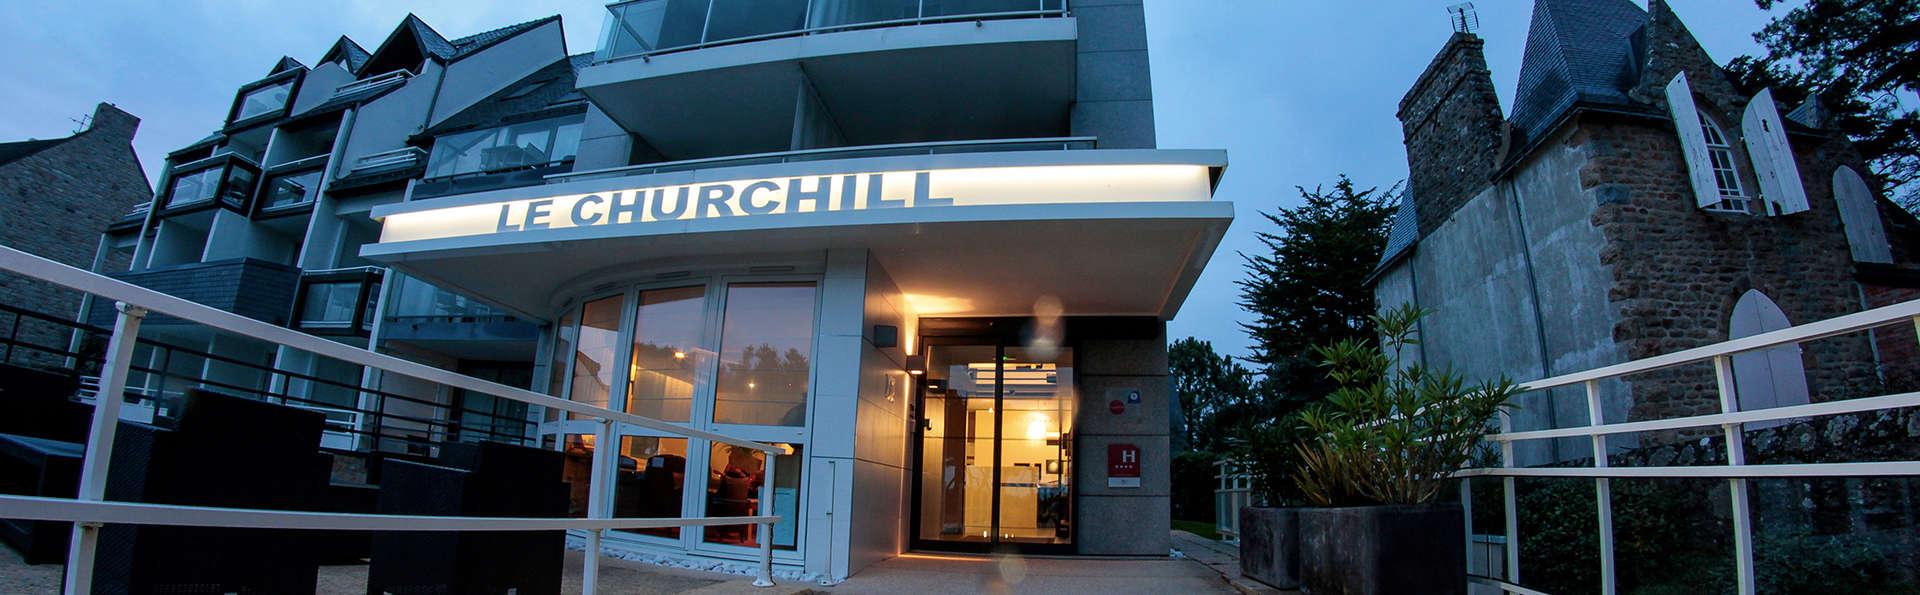 Le Churchill - Edit_Front.jpg